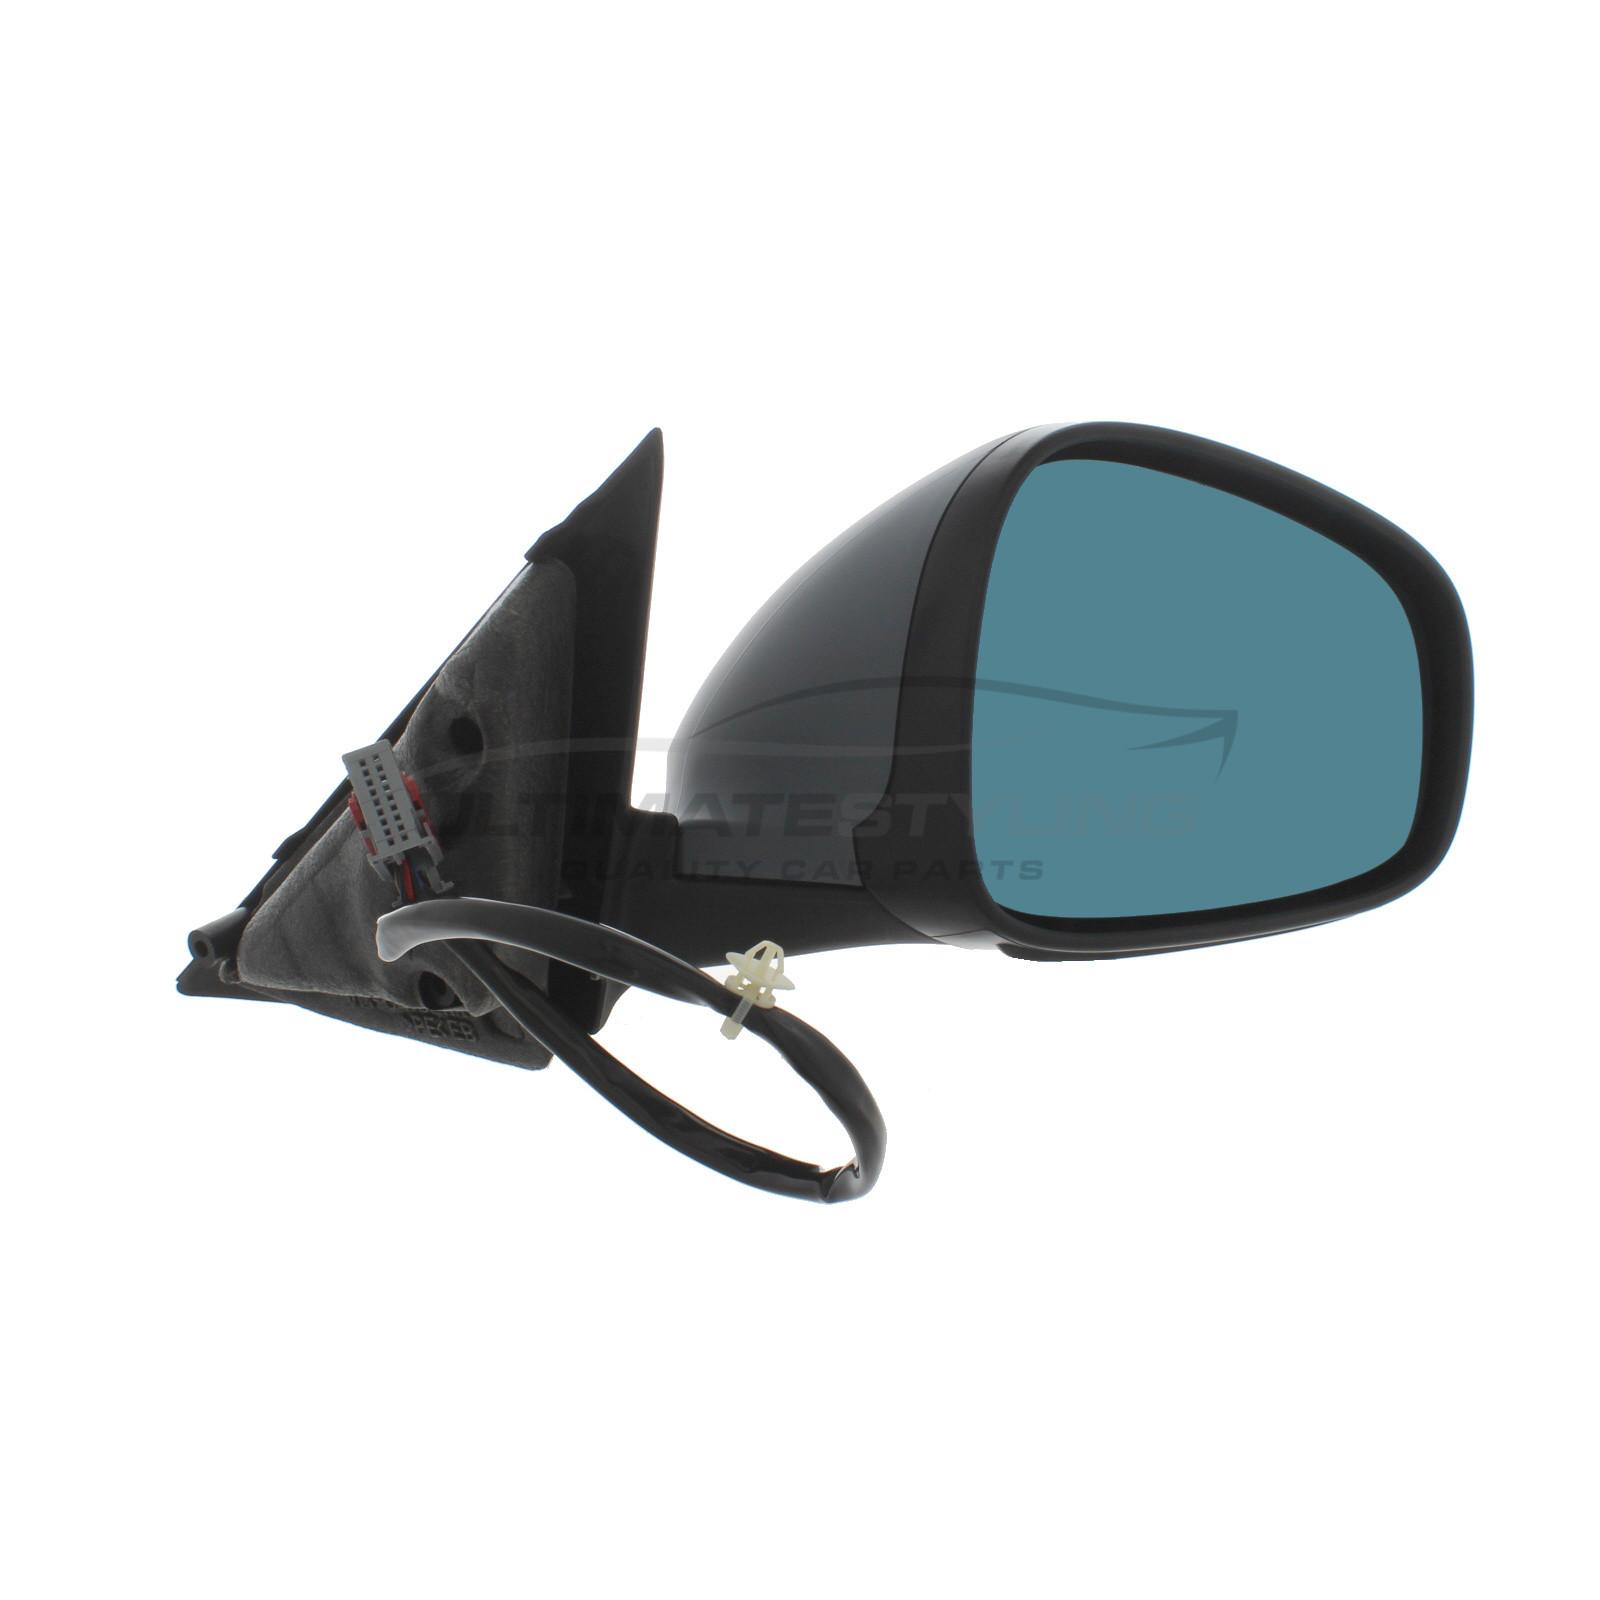 Alfa Romeo 159 Wing Mirror / Door Mirror - Drivers Side (RH) - Electric adjustment - Heated Glass - Power Folding - Temperature Sensor - Primed